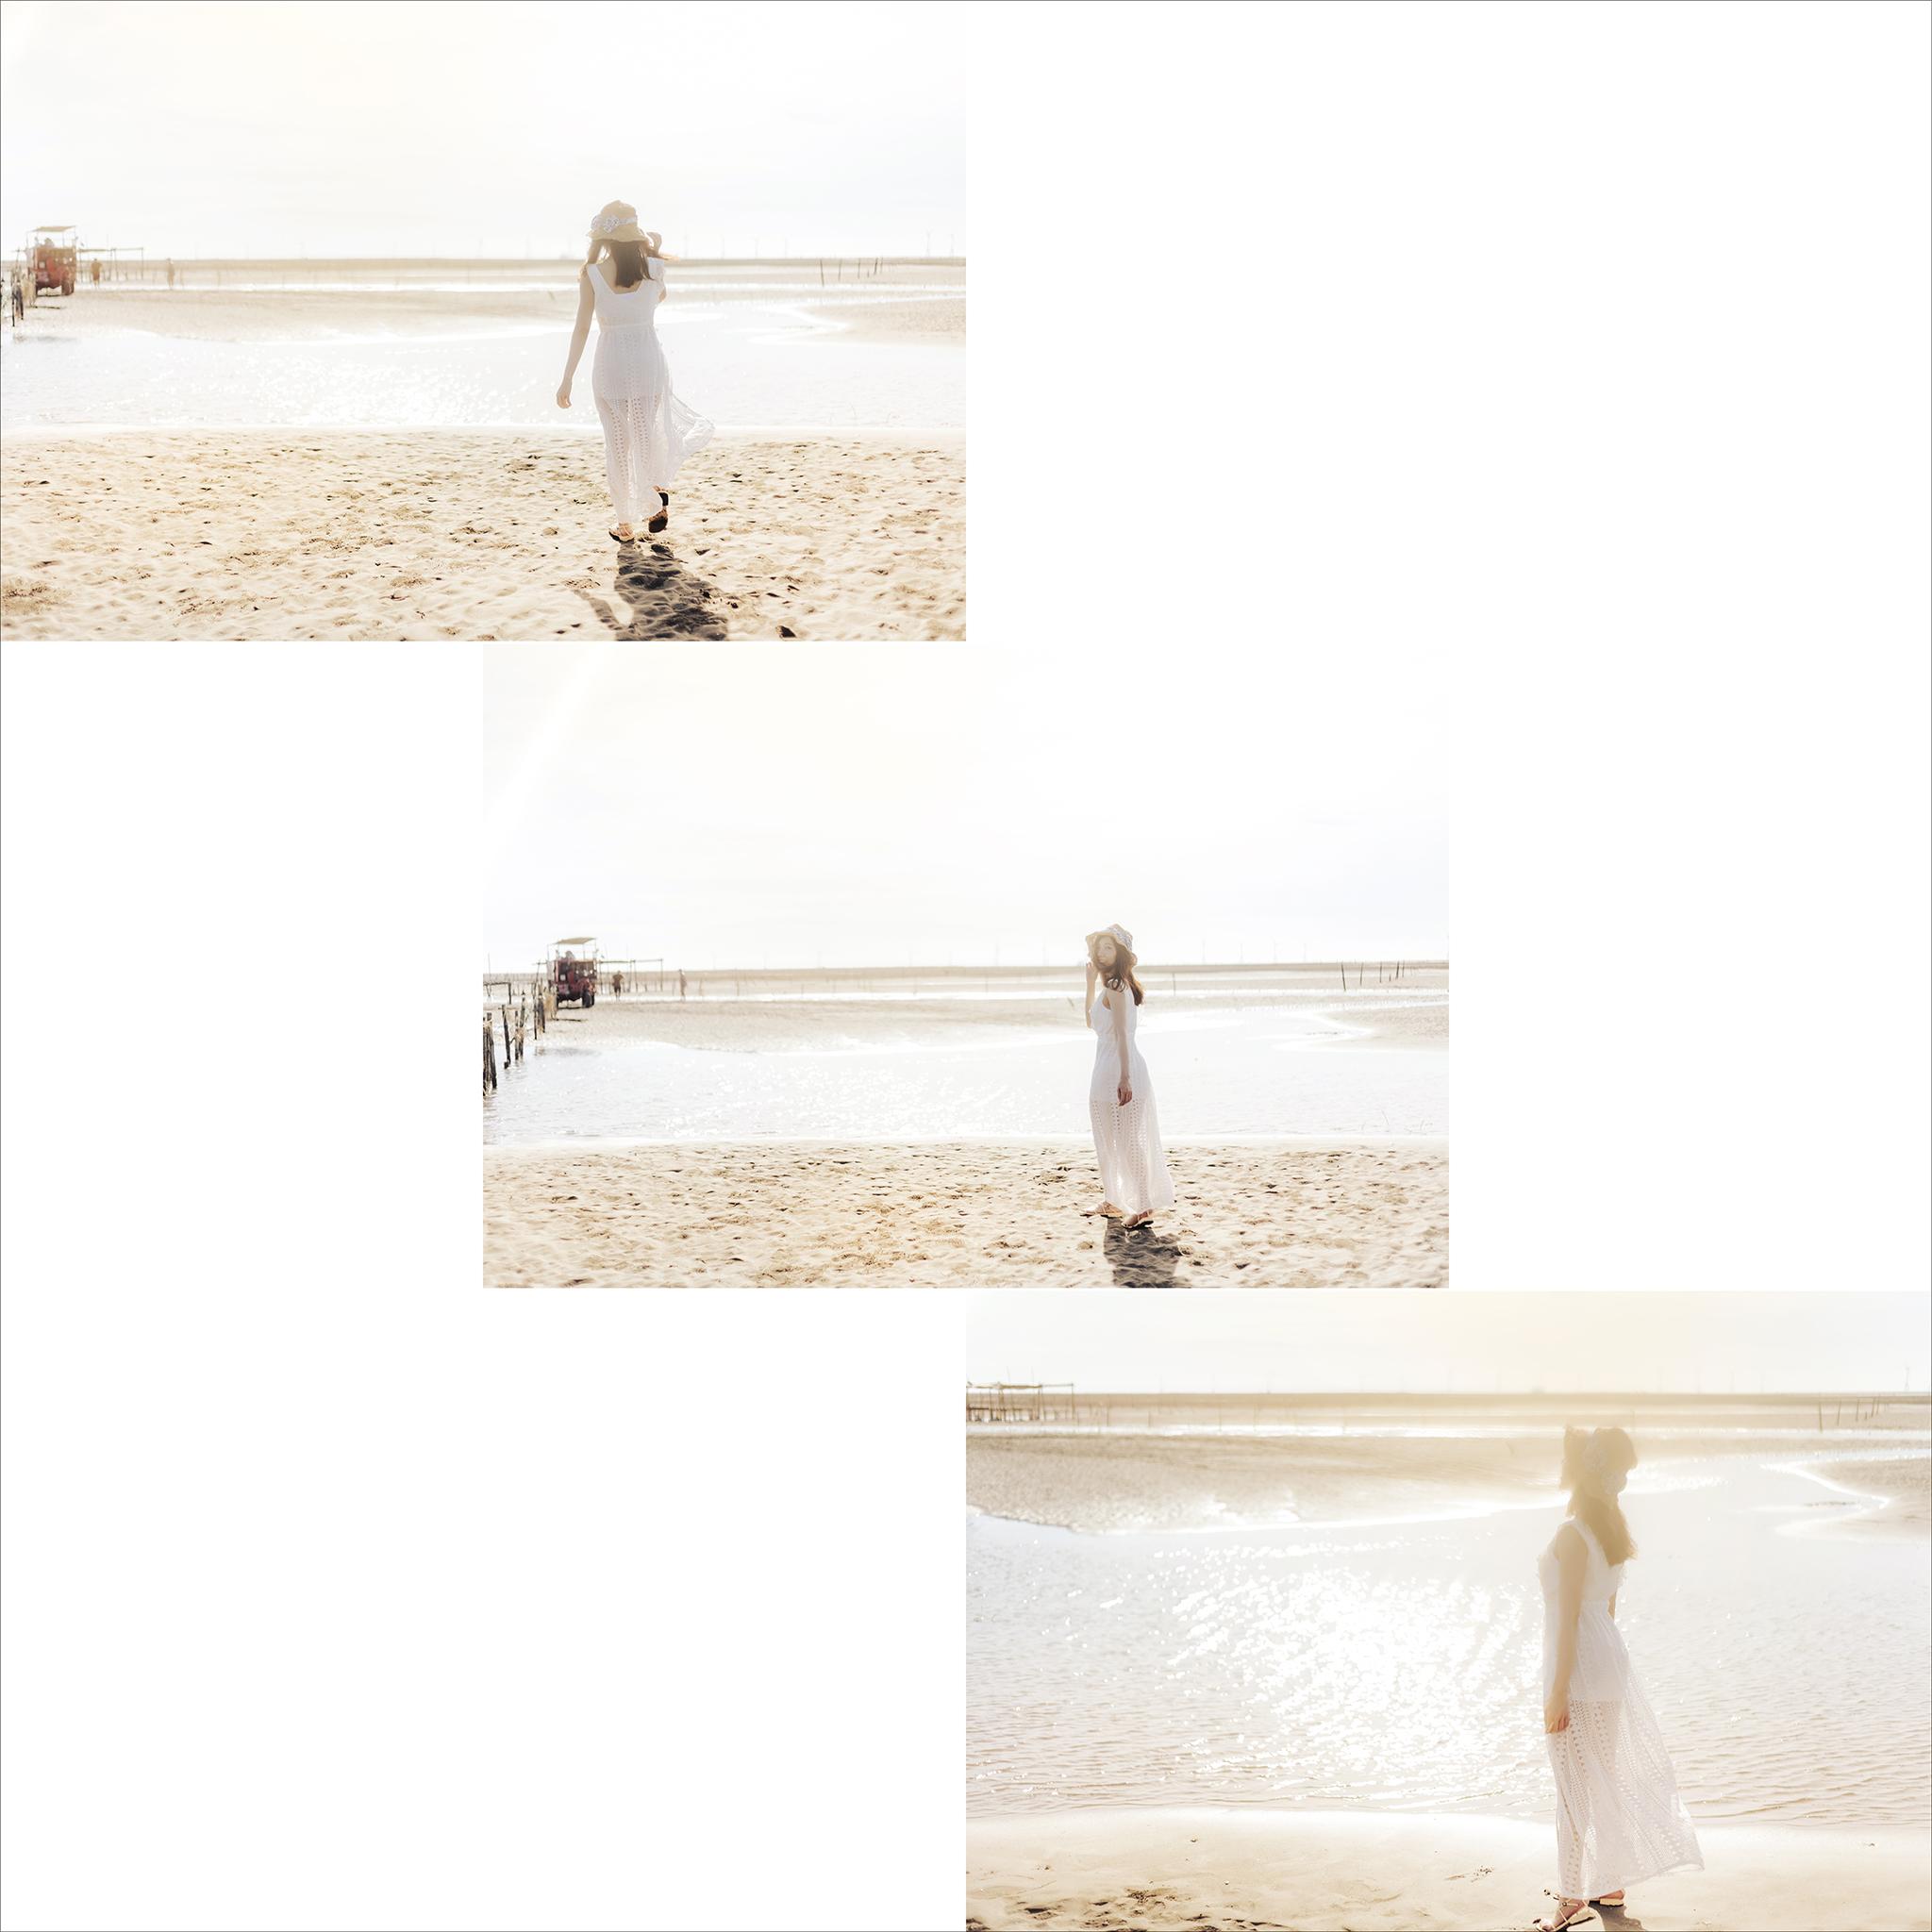 51391539868 ccd9e4c890 o - 【夏季寫真】+Shan+EP3